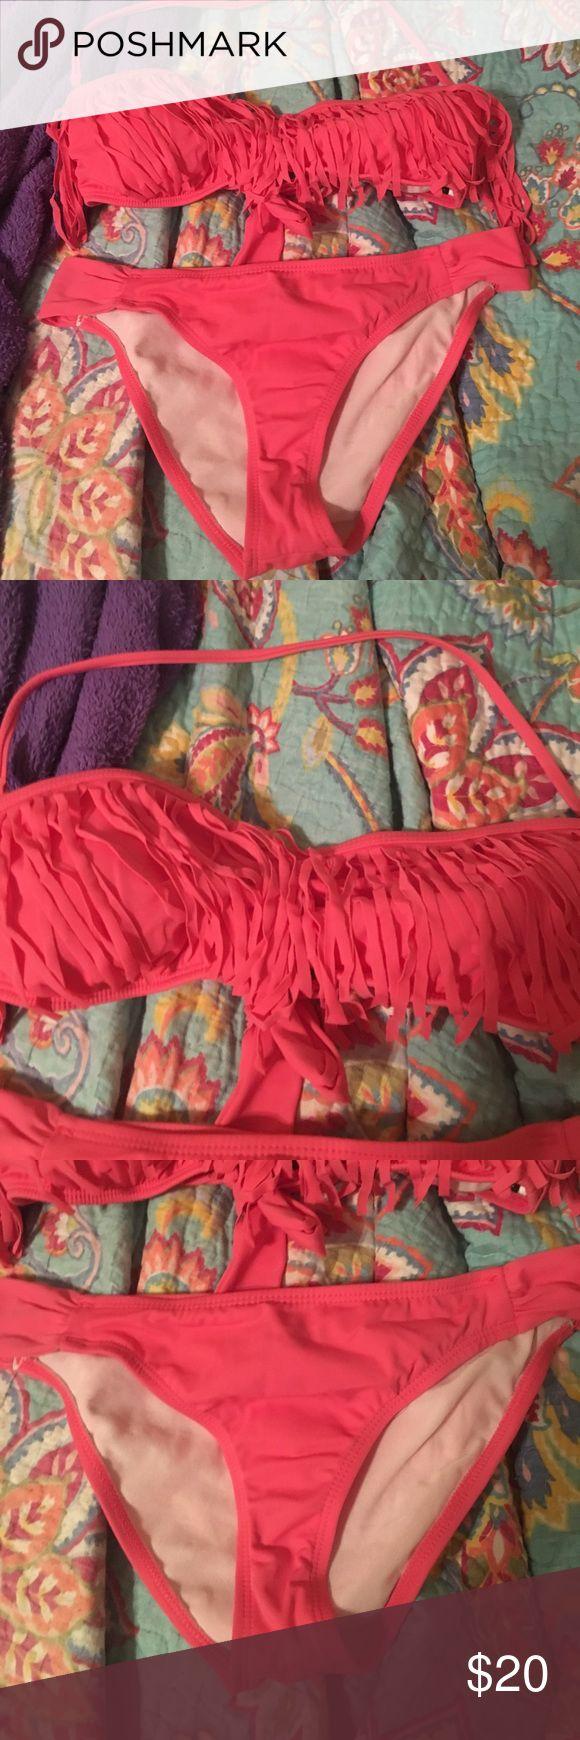 Guess Fringe Bikini Hot pink fridge bikini by Guess. Worn twice. Size M. Guess Swim Bikinis